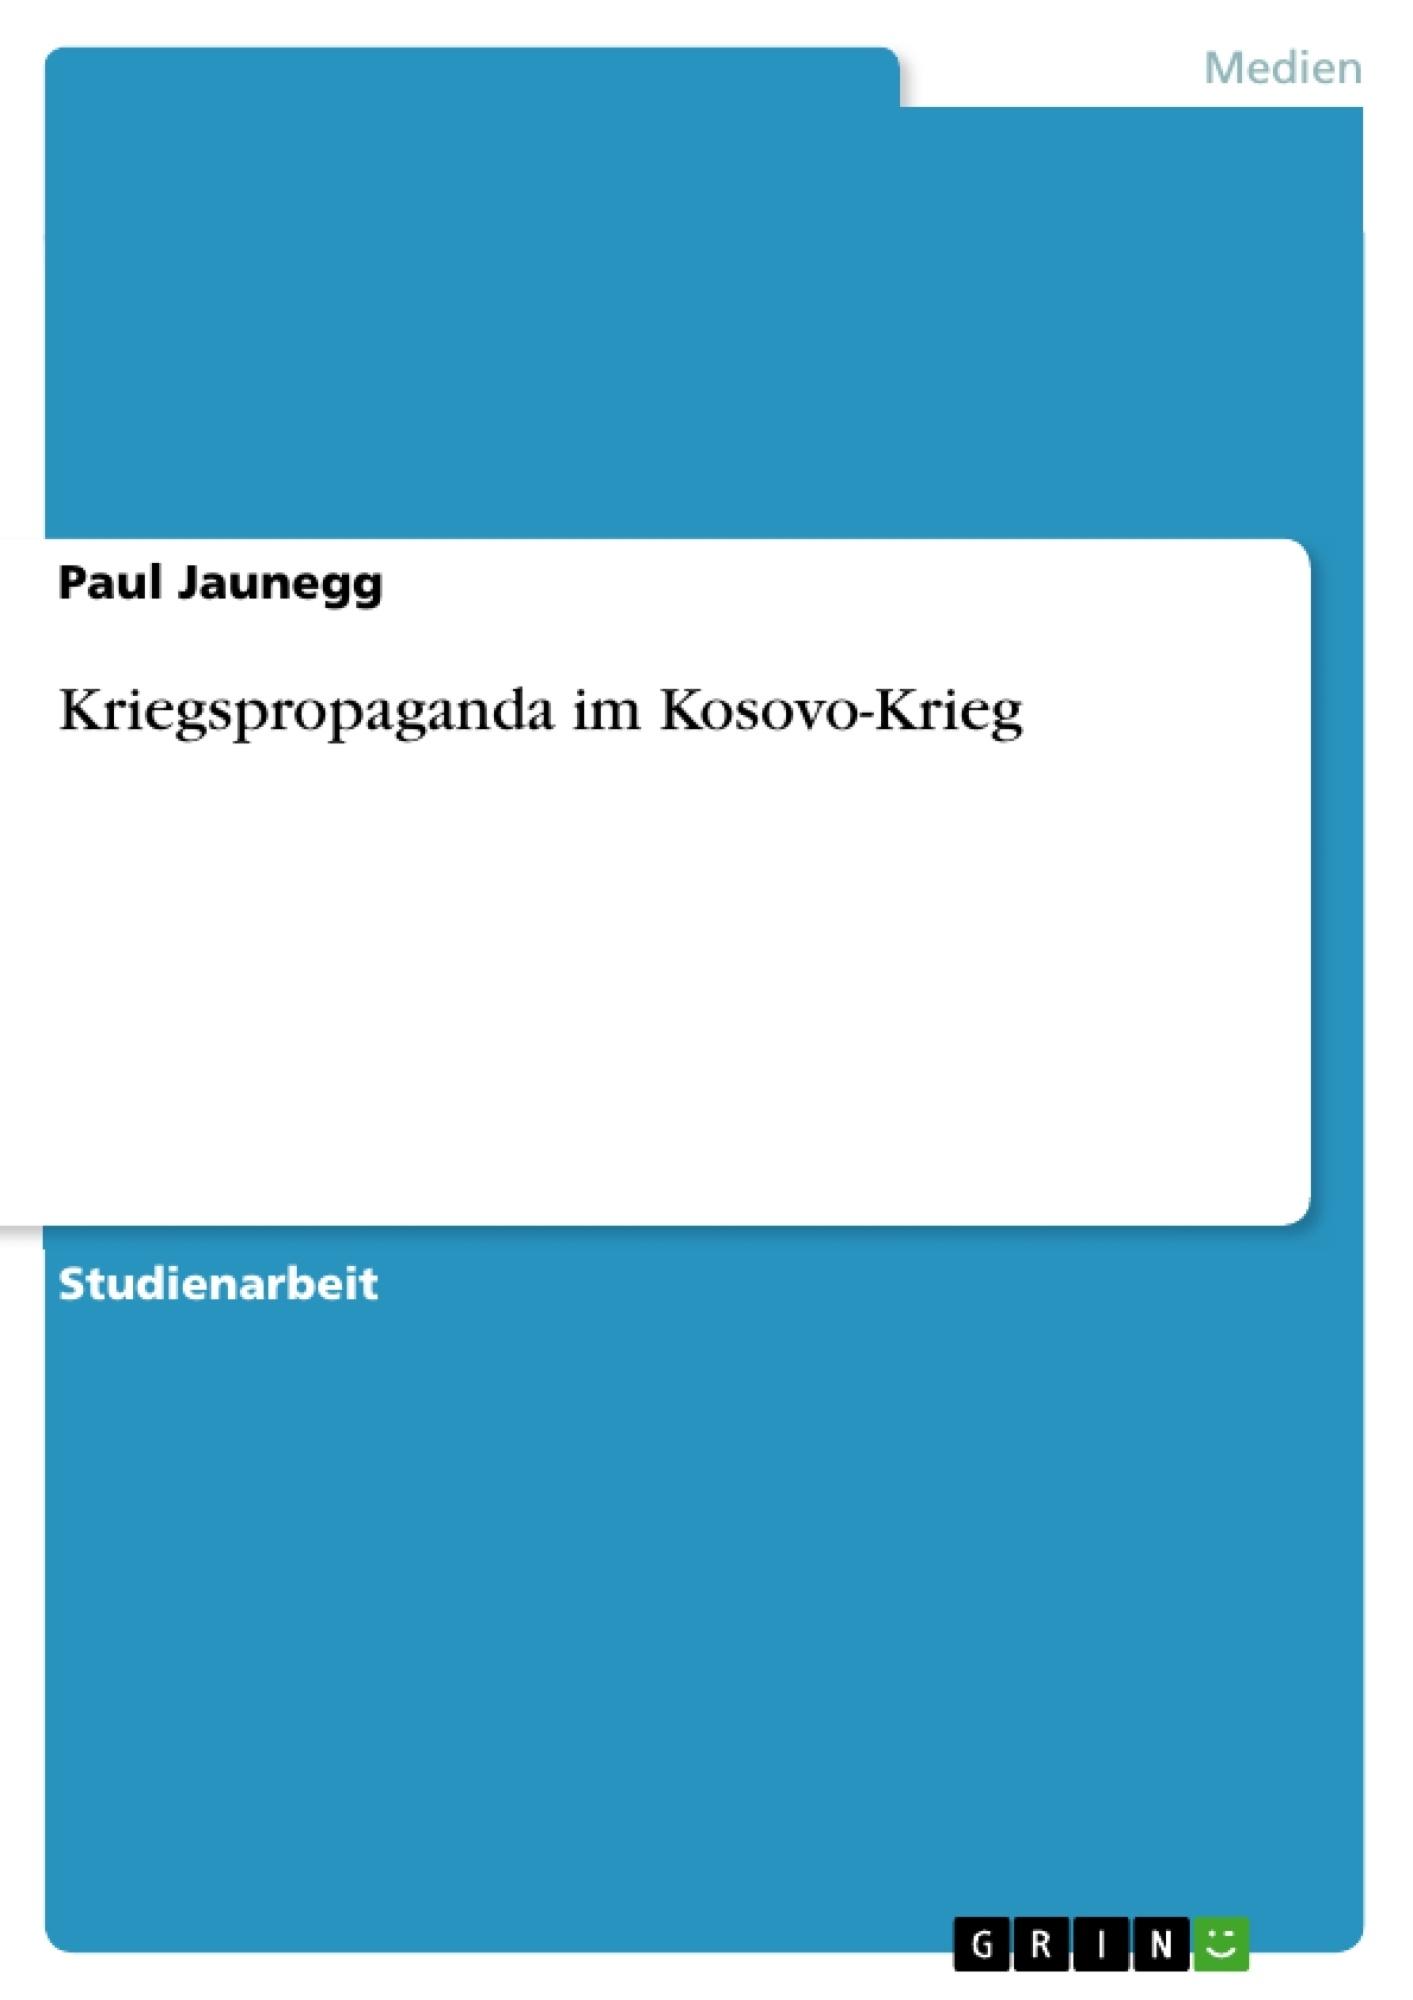 Titel: Kriegspropaganda im Kosovo-Krieg